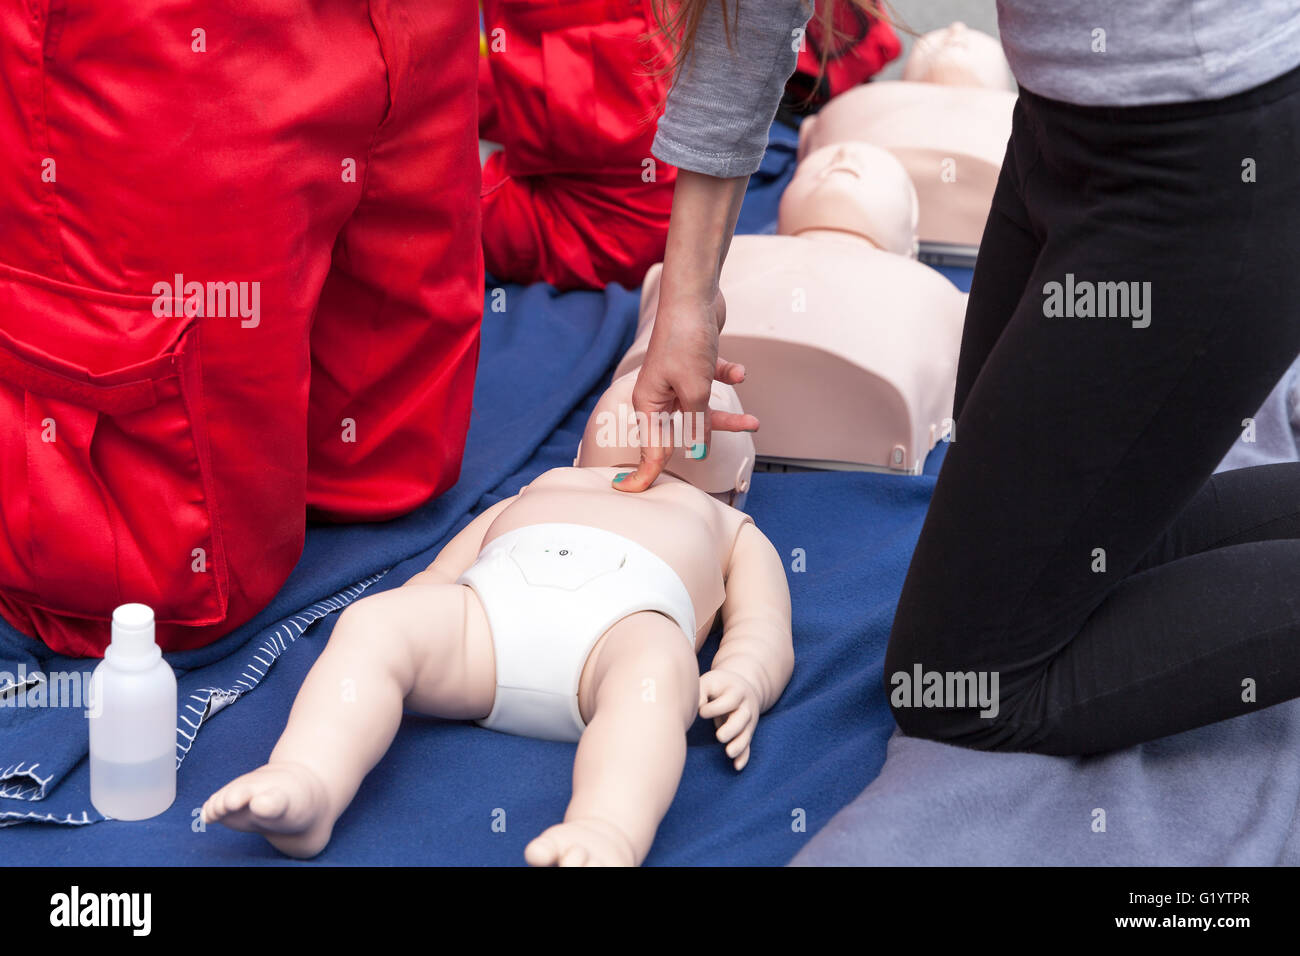 83a68fb1b1 Infant CPR training manikin first aid. Cardiopulmonary resuscitation - CPR.